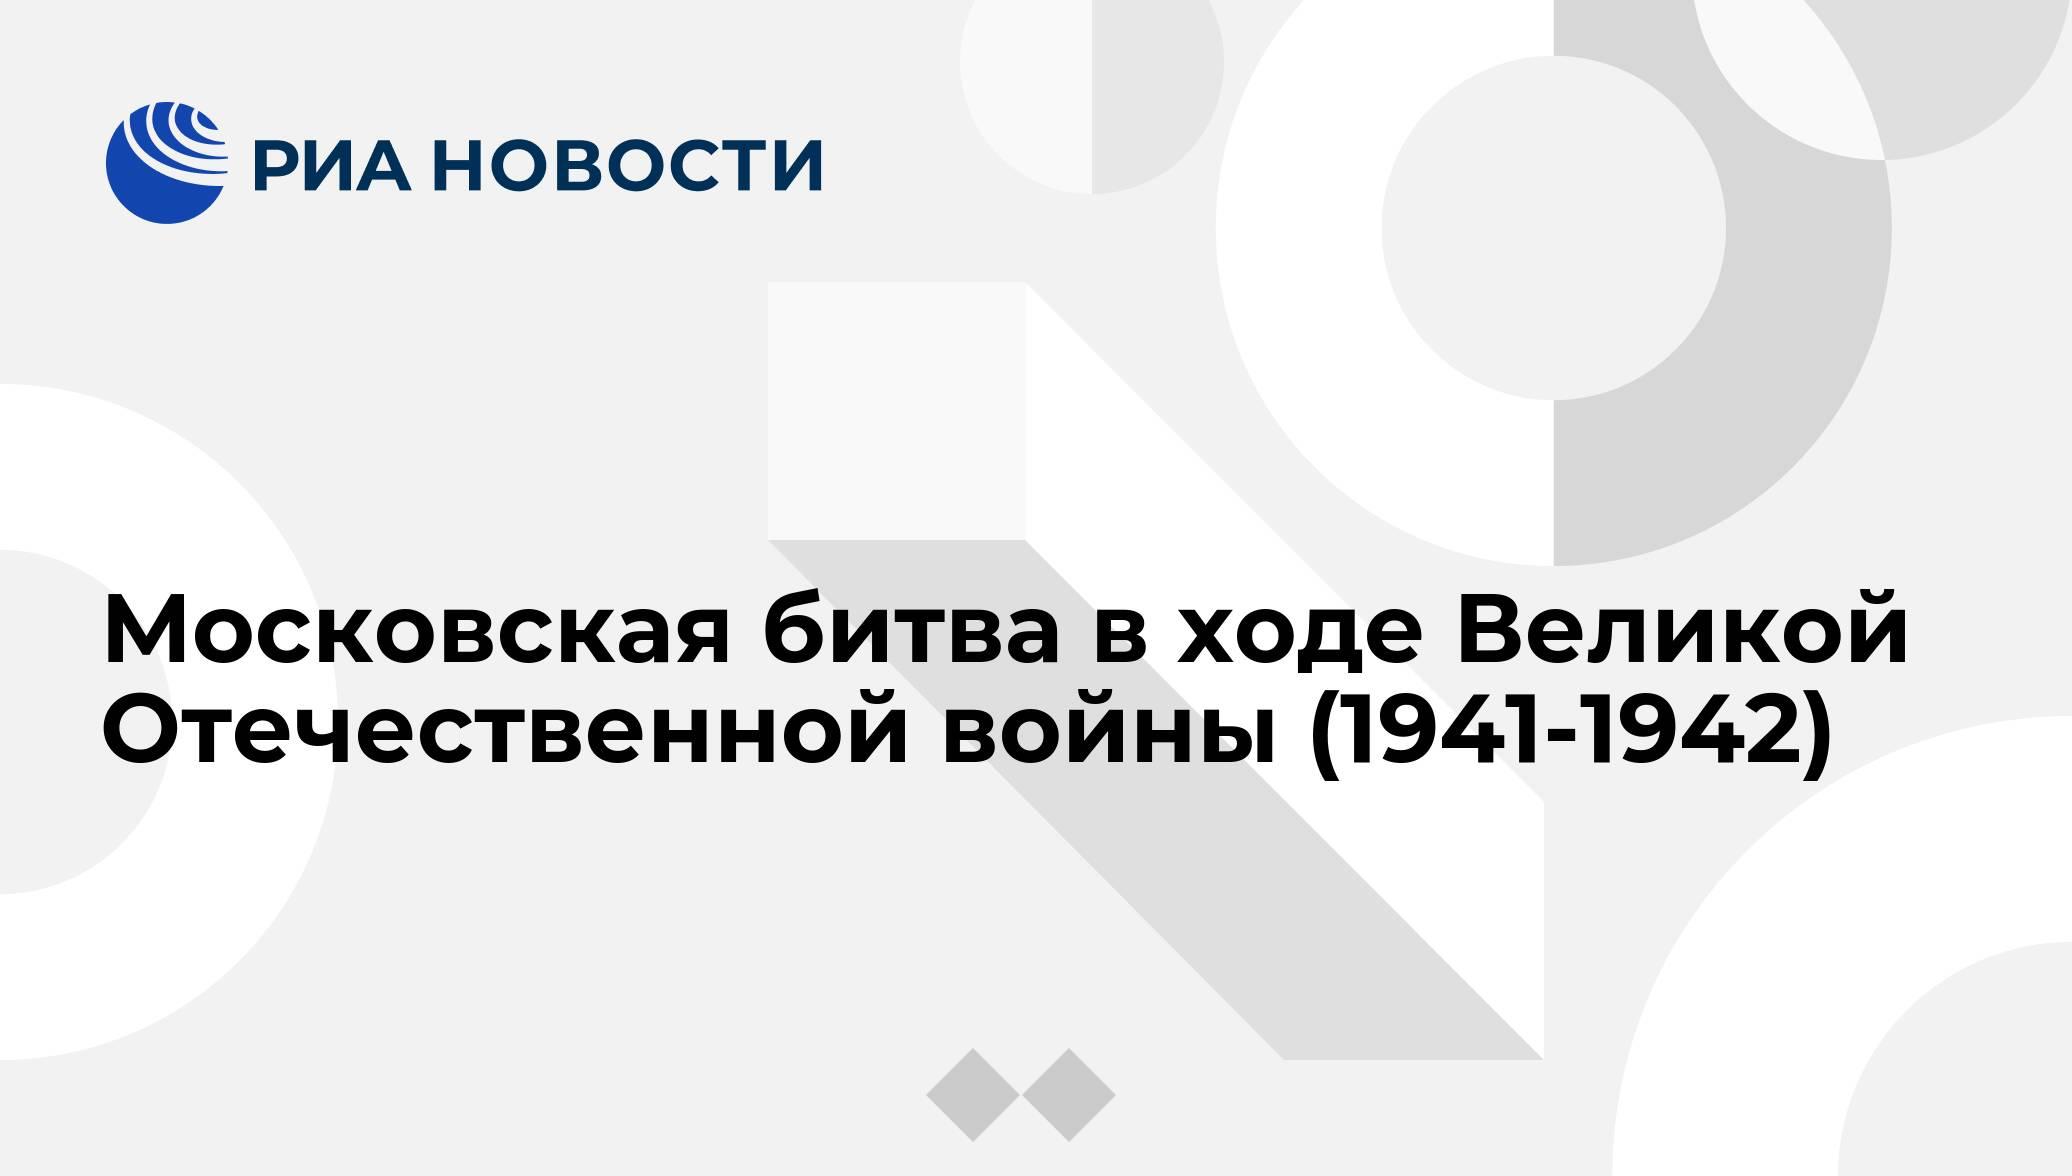 Доклад на тему московская битва 3736